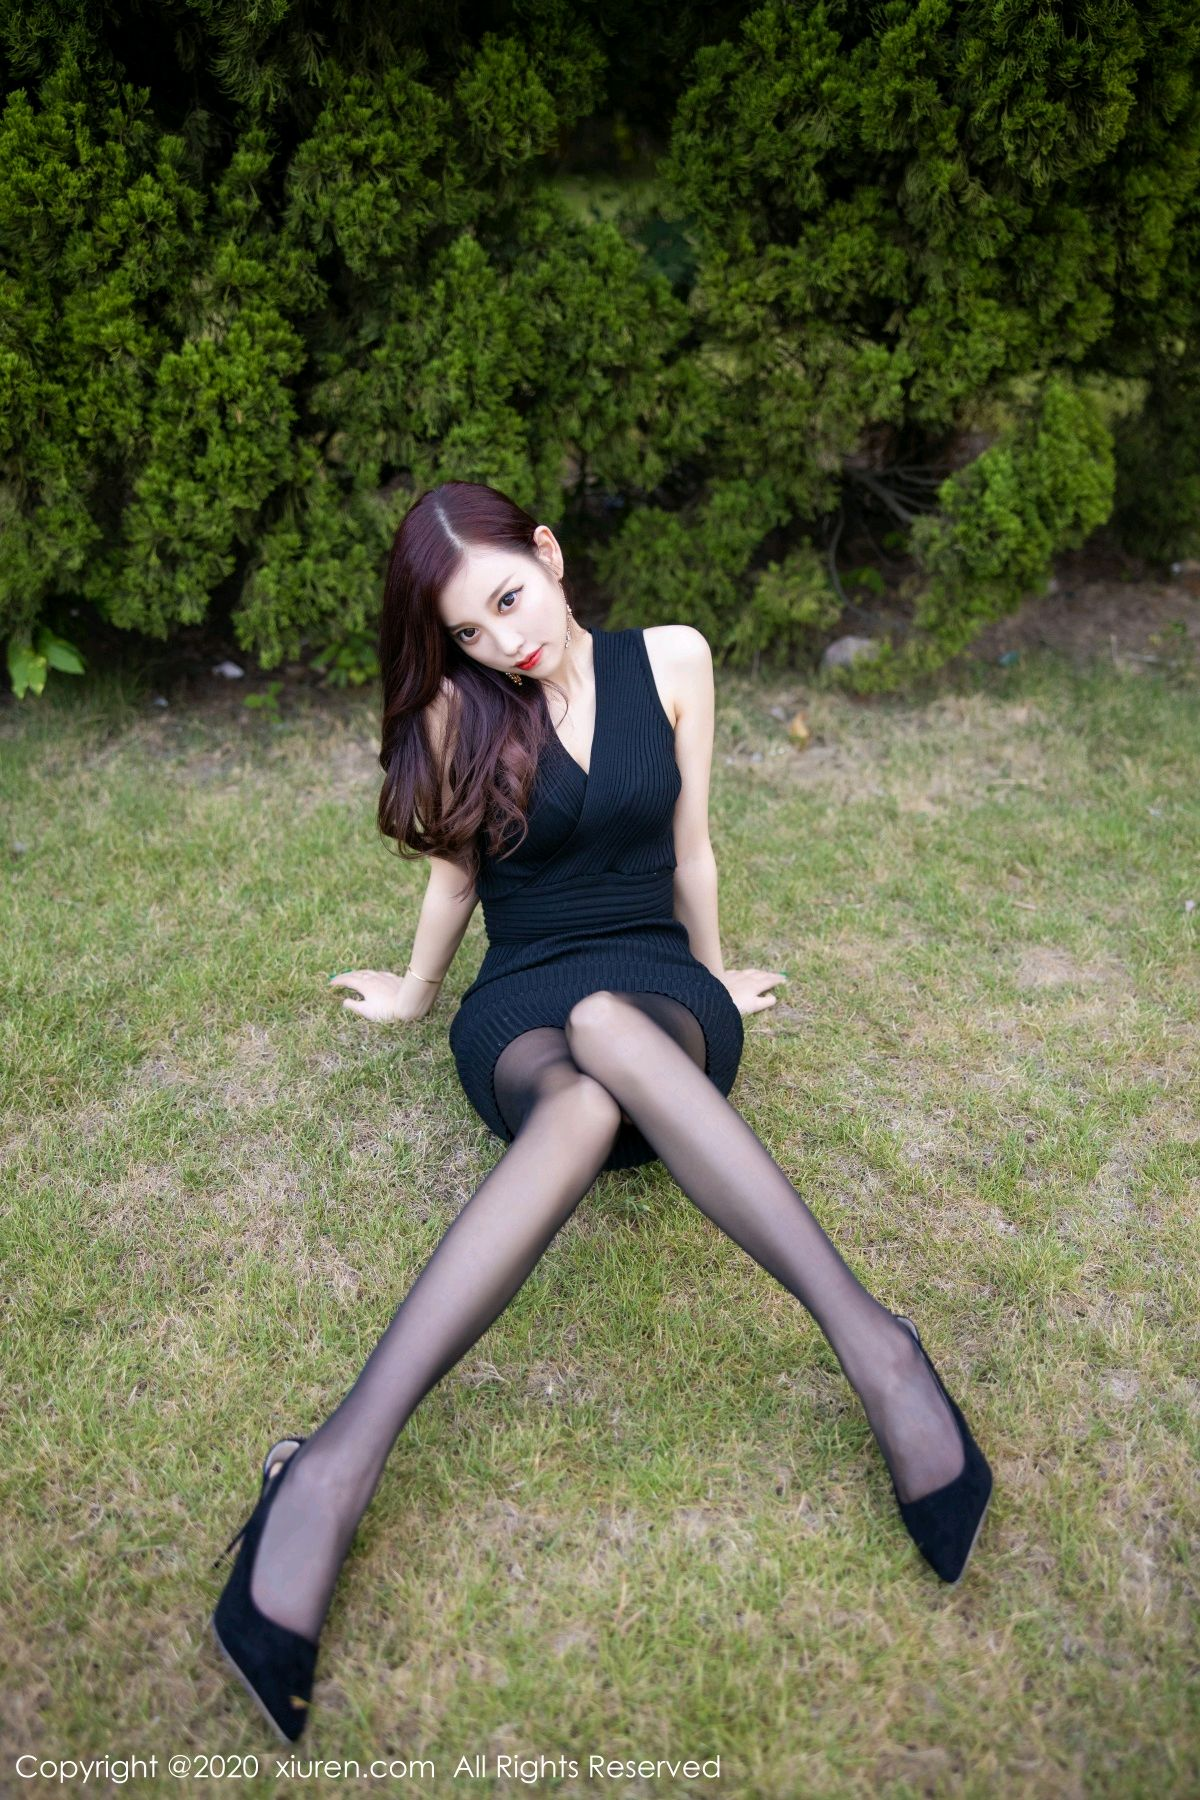 [XiuRen] Vol.2648 Yang Chen Chen 19P, Black Silk, Outdoor, Xiuren, Yang Chen Chen